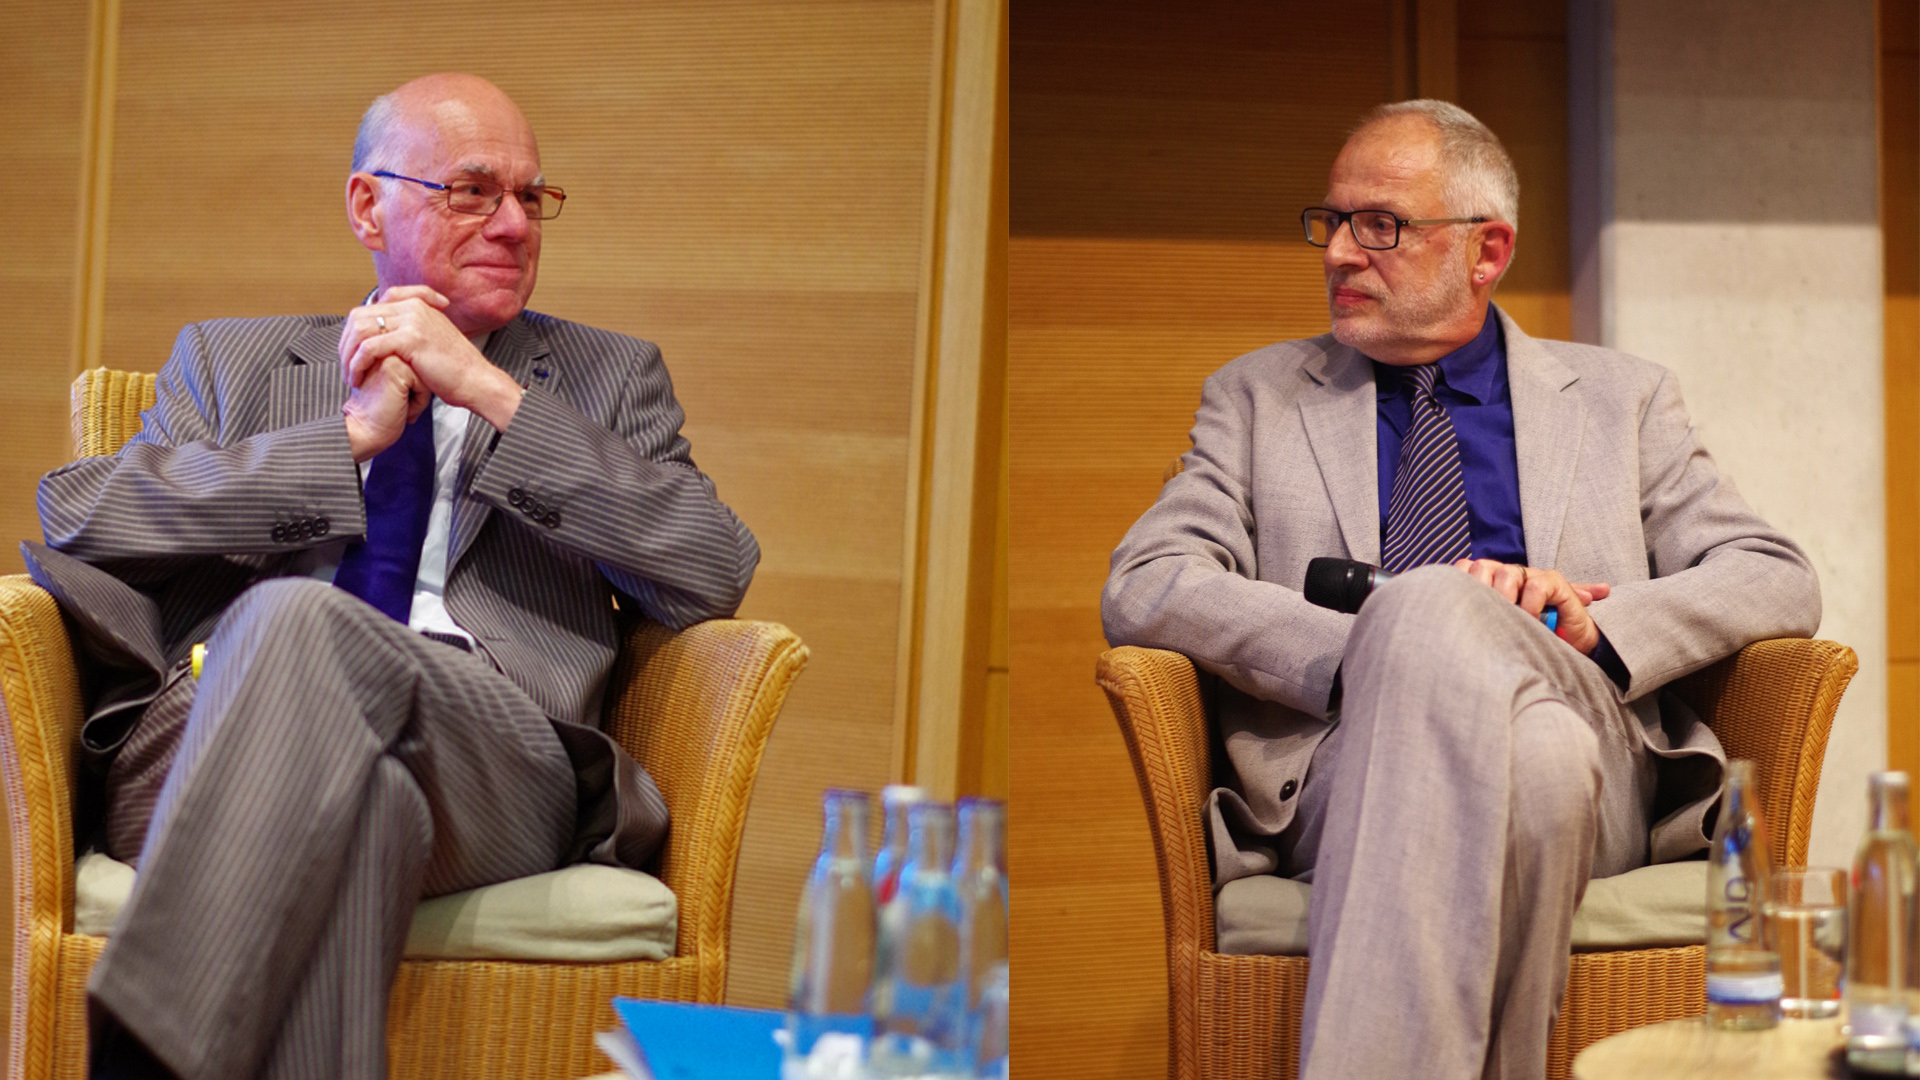 Norbert Lammert und Komponist Stefan Heucke bei der Pressekonferenz in Berlin